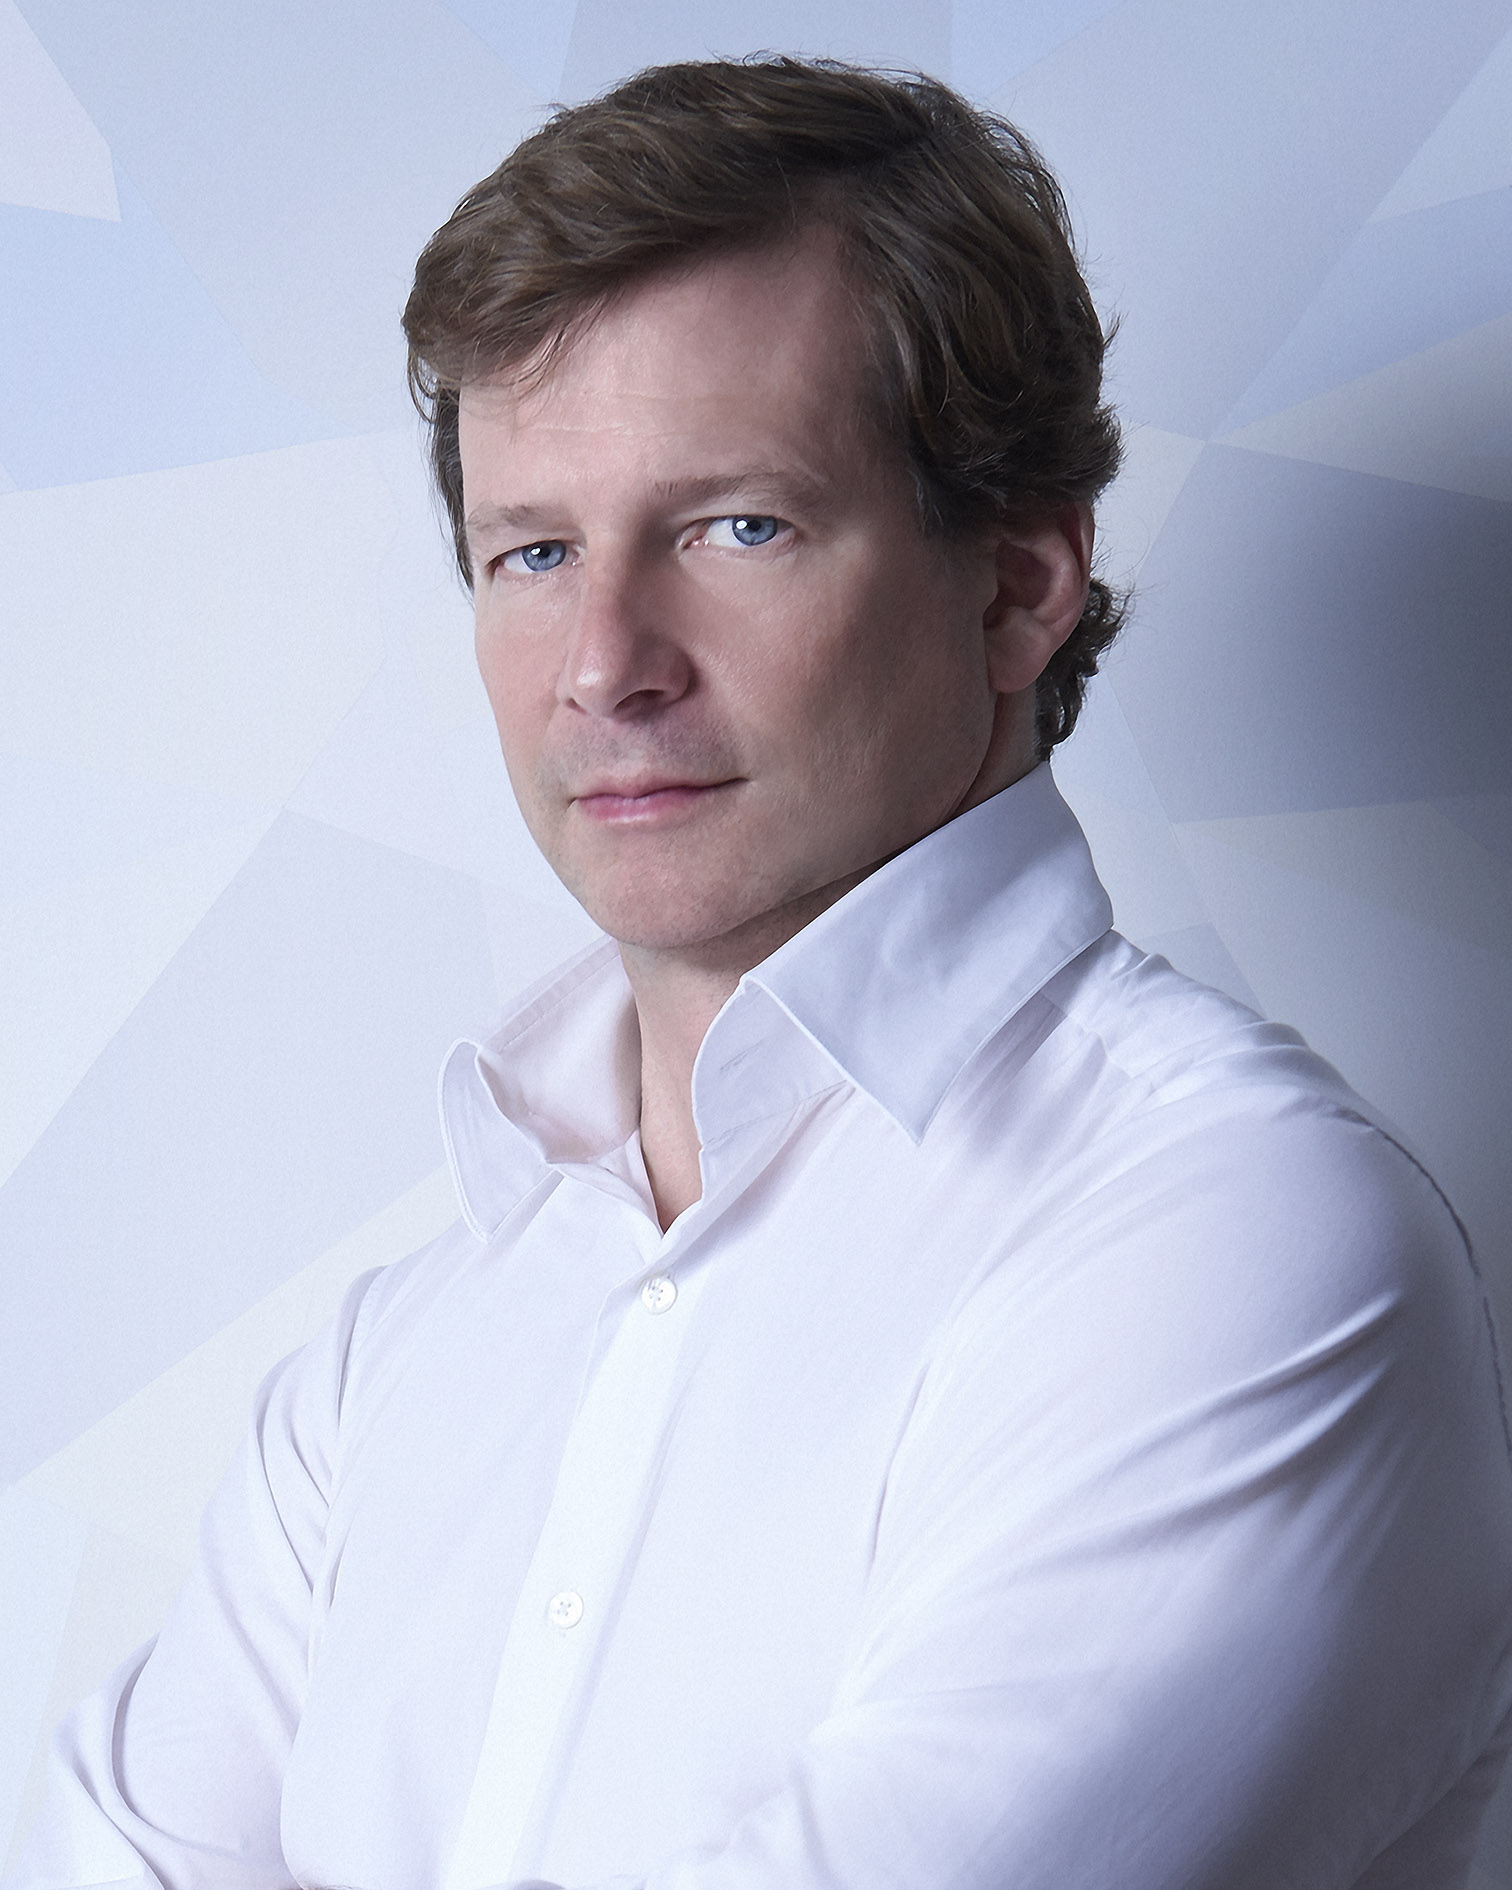 Lorenz Bäumer_s Official Portrait by Oleg Covian.jpg